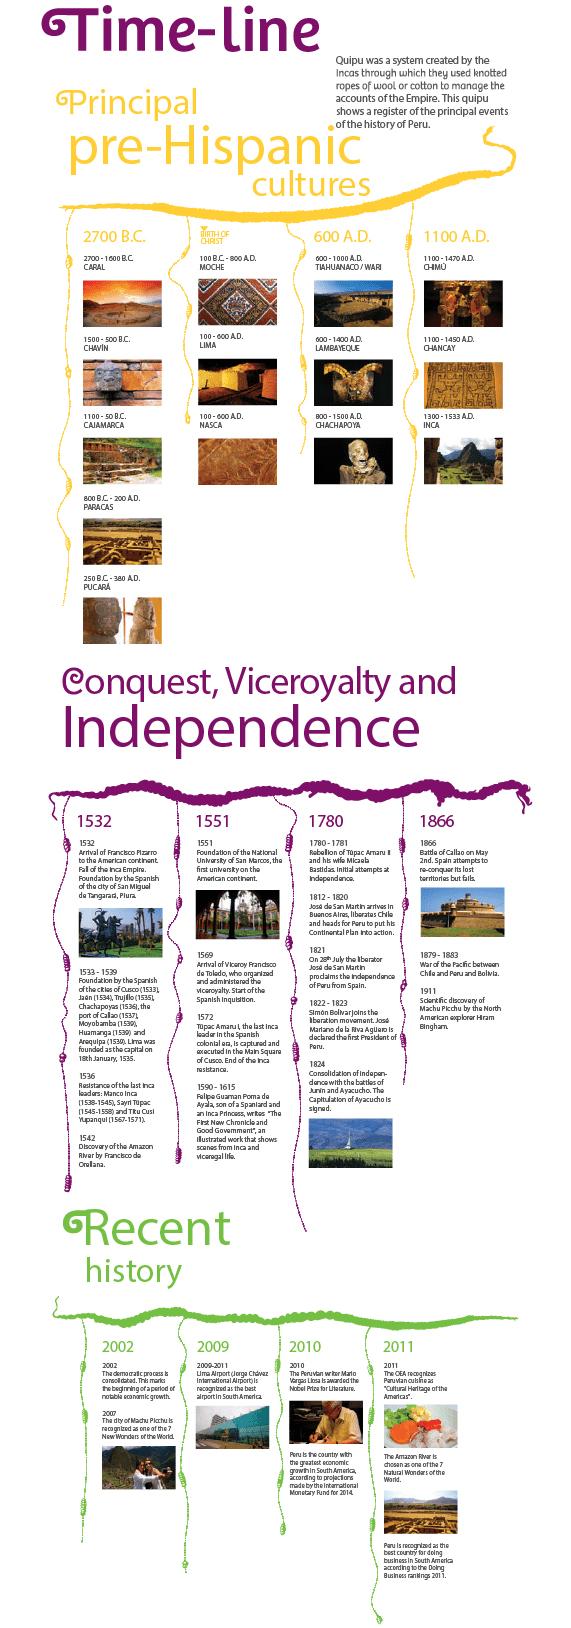 Piura in the past, History of Piura